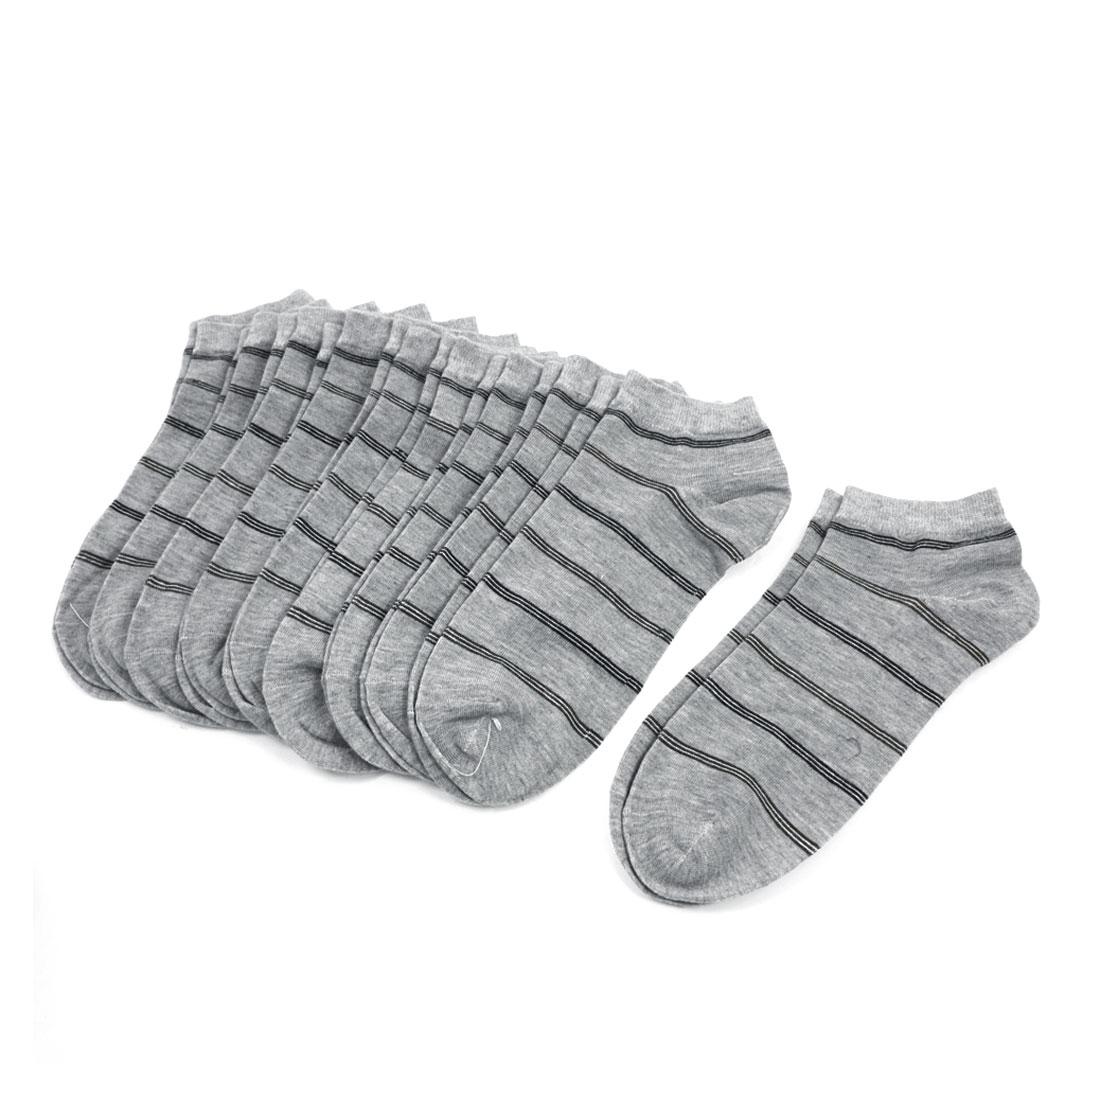 10 Pairs Stripe Pattern Elastic Low Cut Ankle Socks 4 Color for Man Men